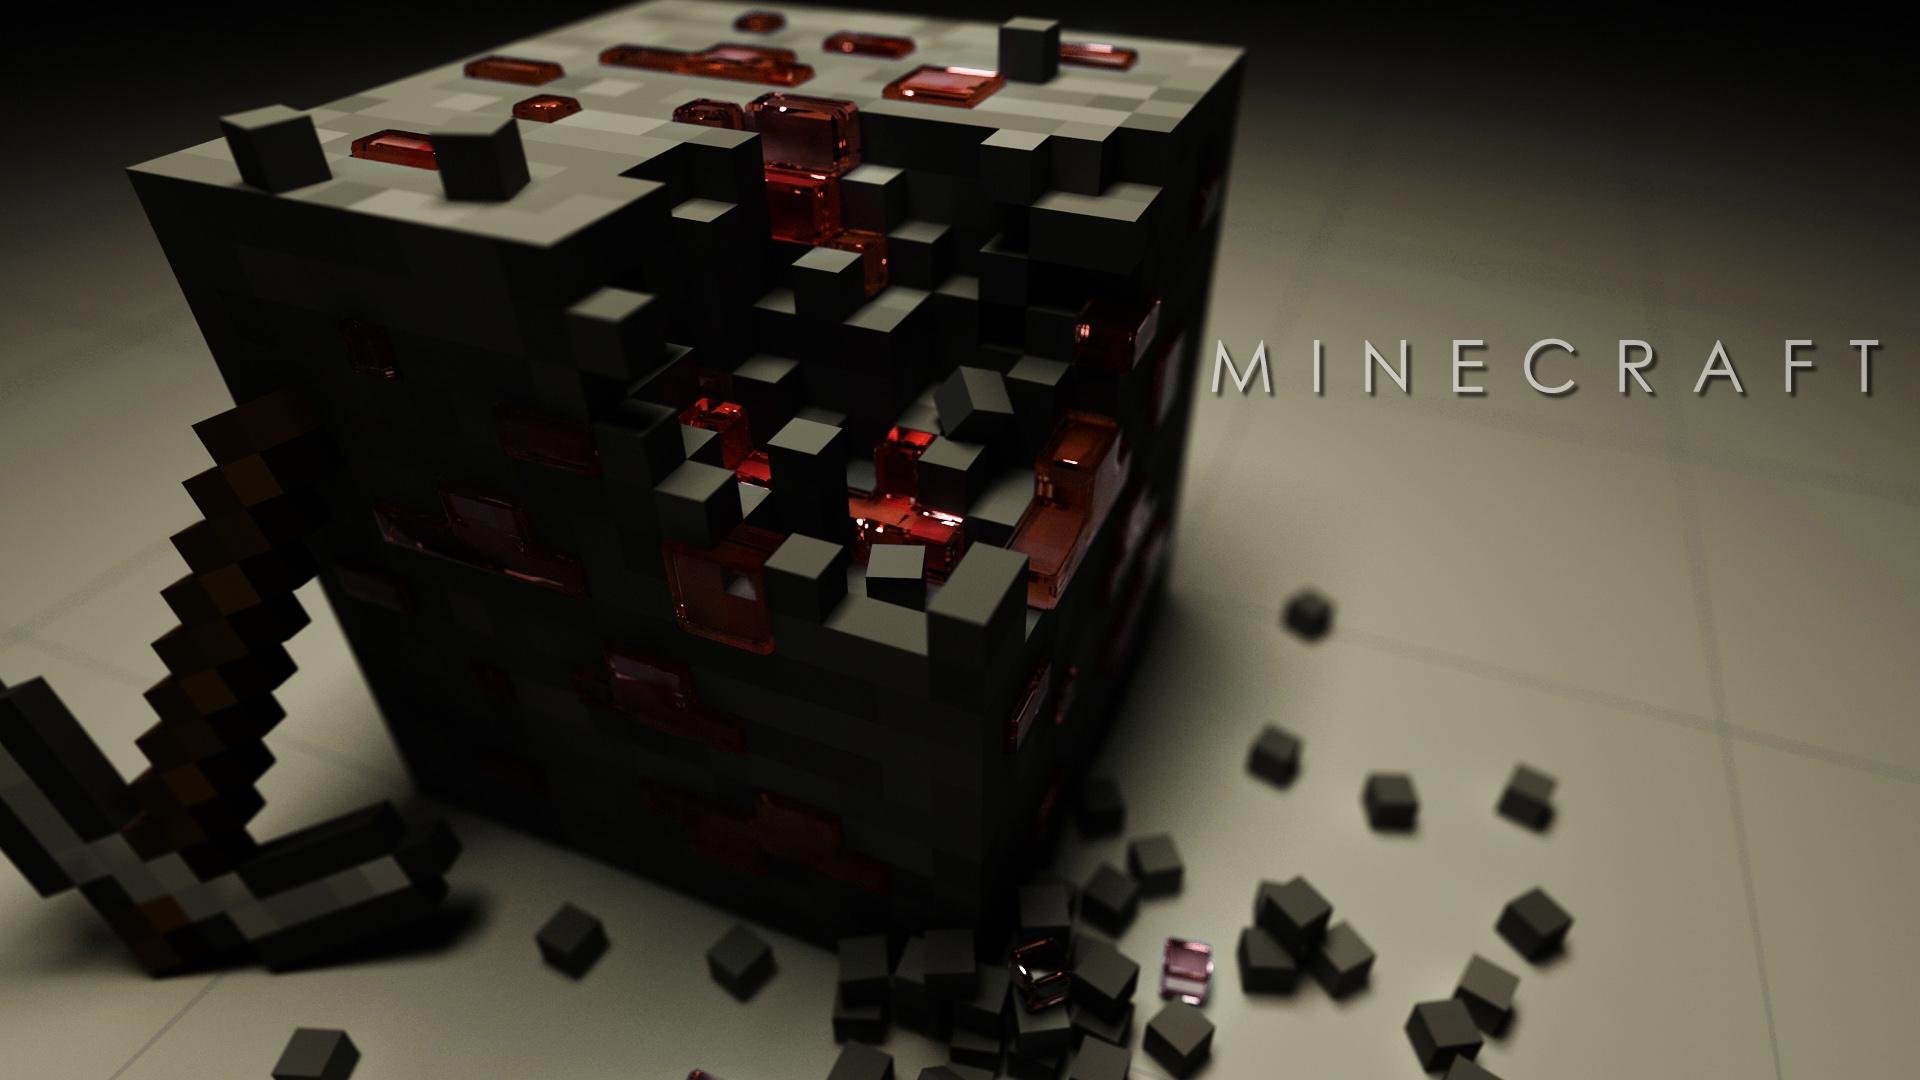 minecraft diamond ore block read sources cool minecraft logo read 1920x1080